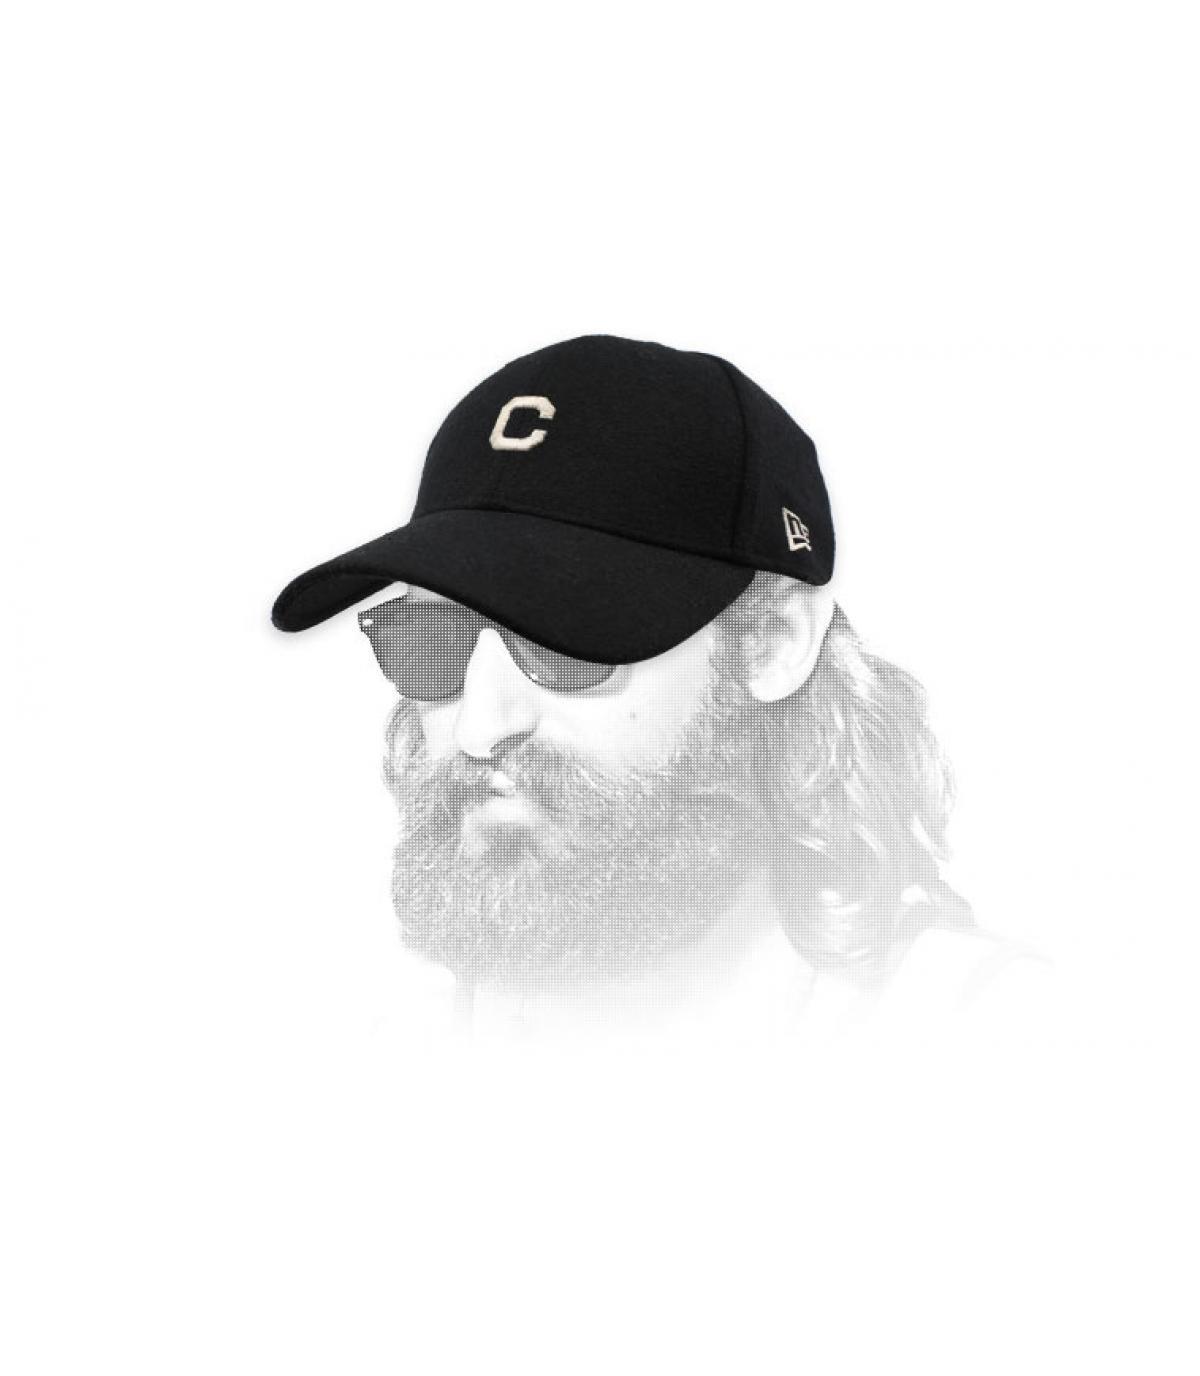 gorra C negro